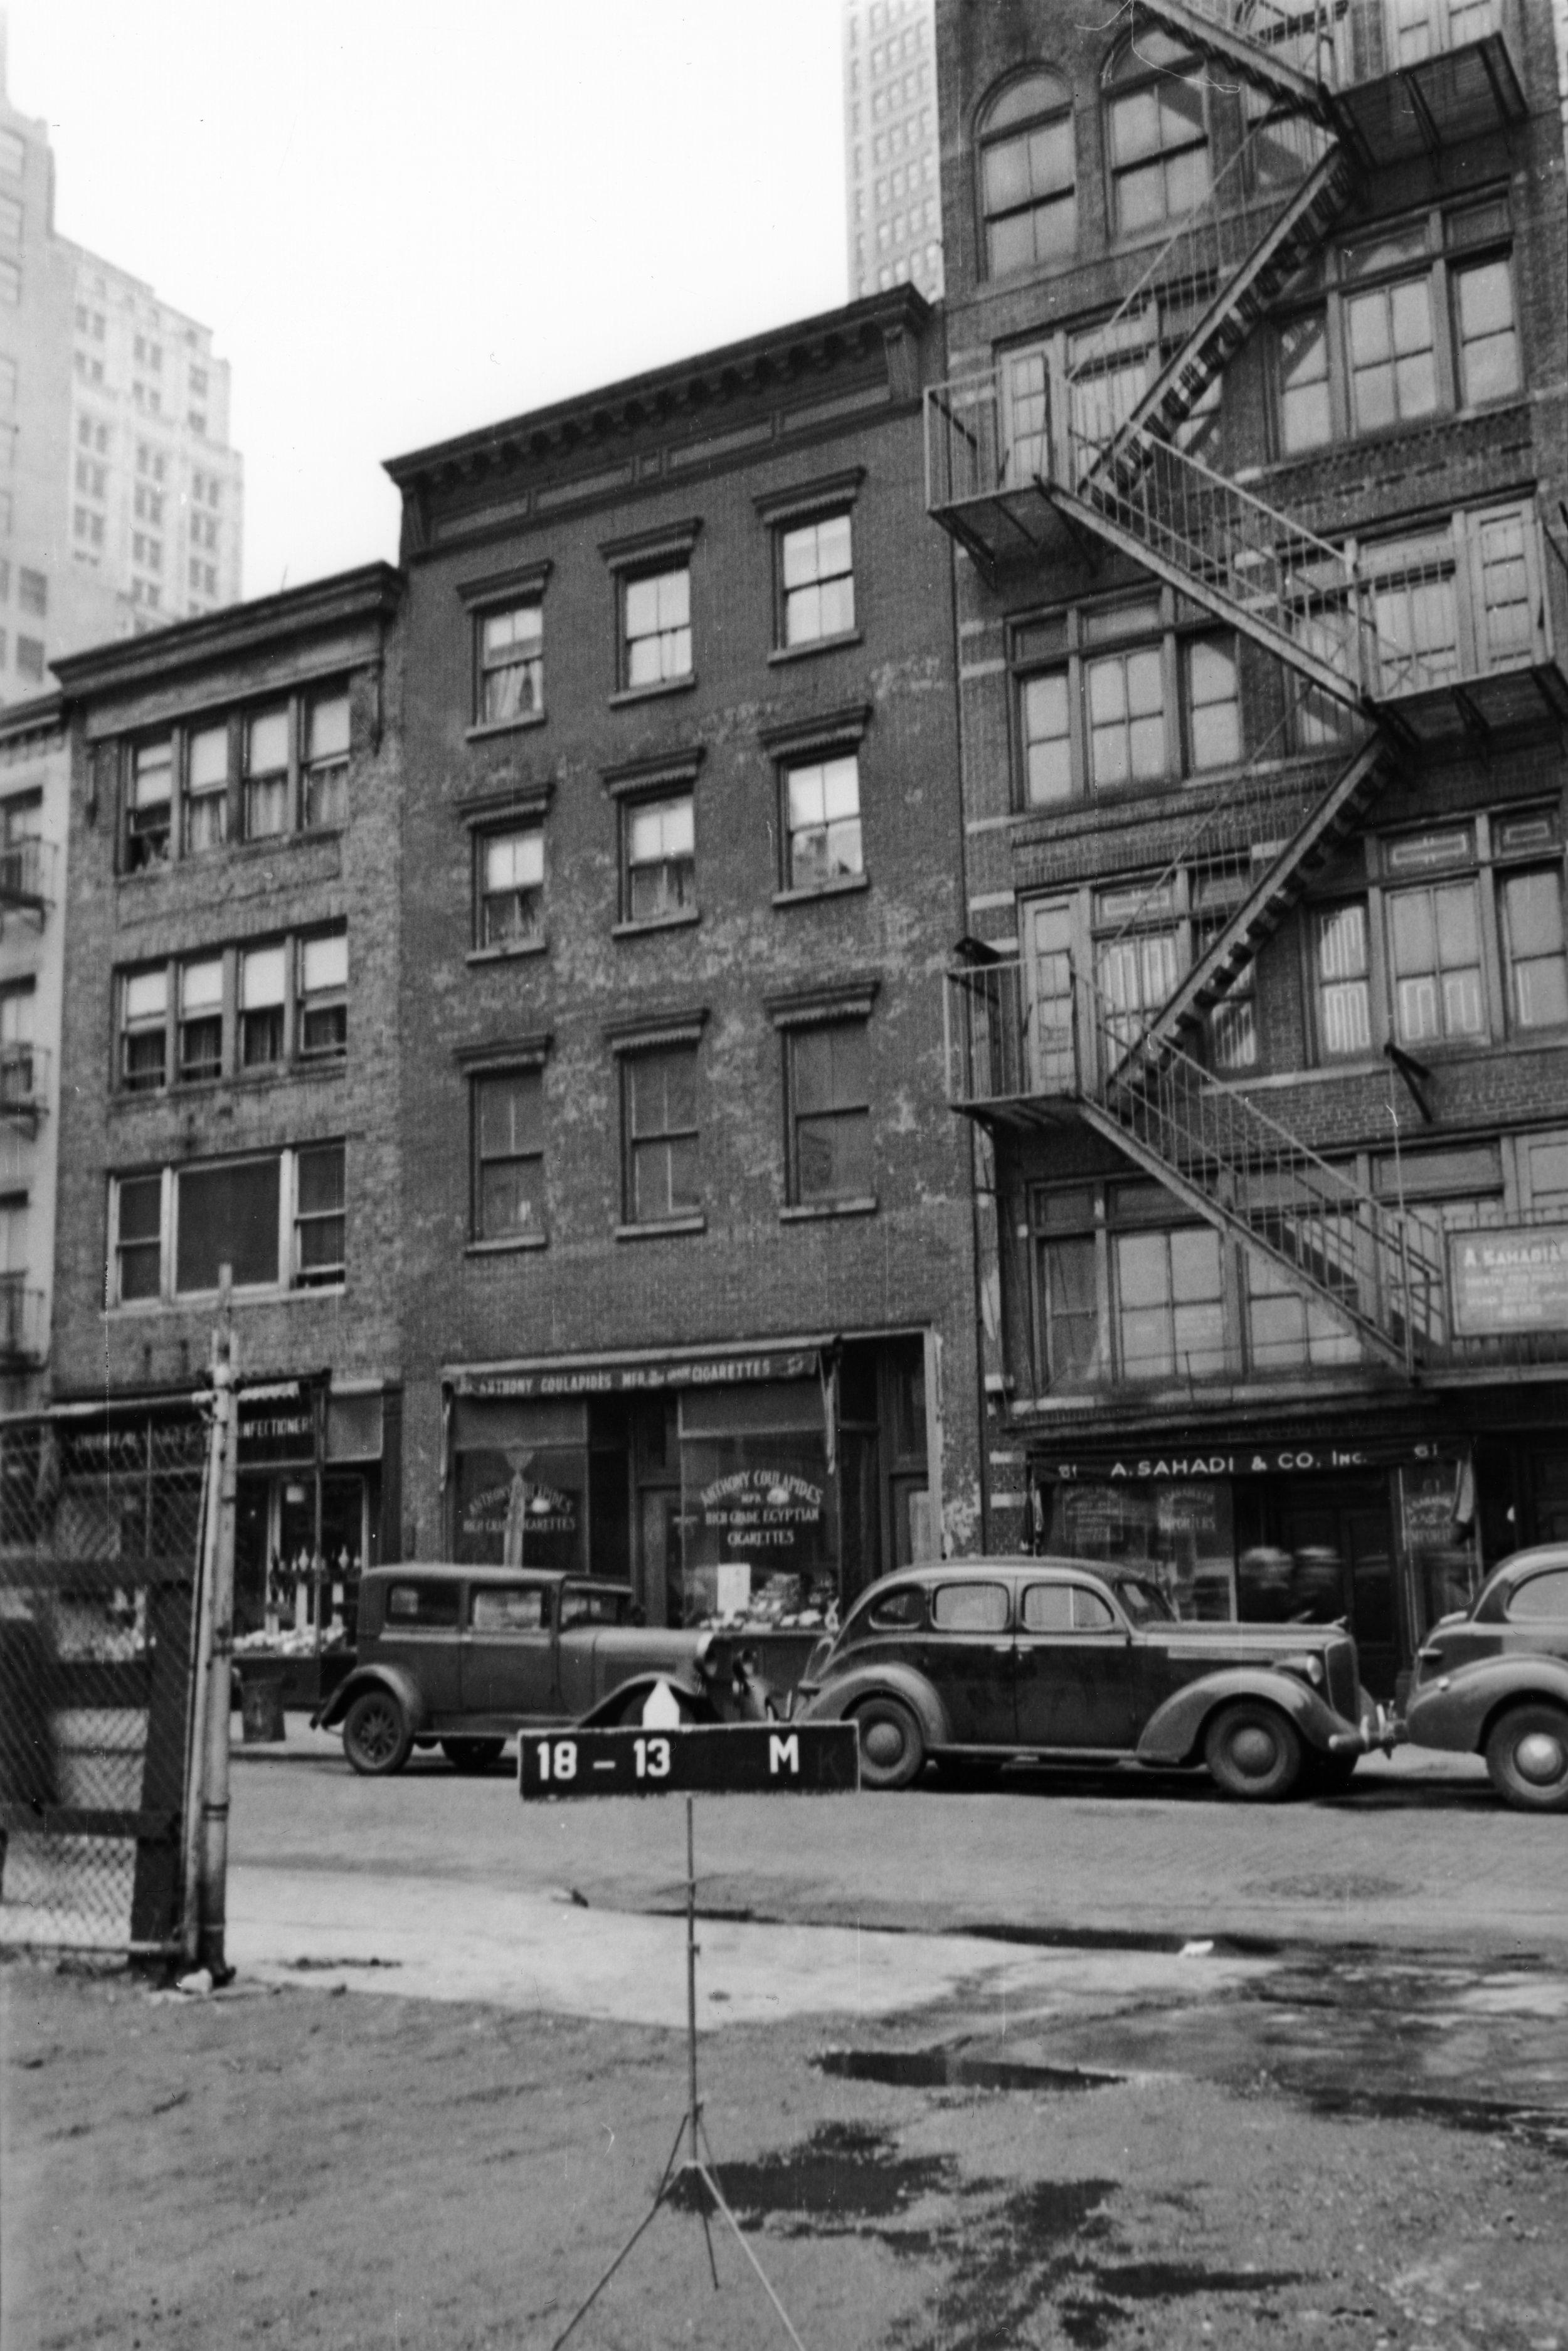 63 Washington Street, ca. 1939